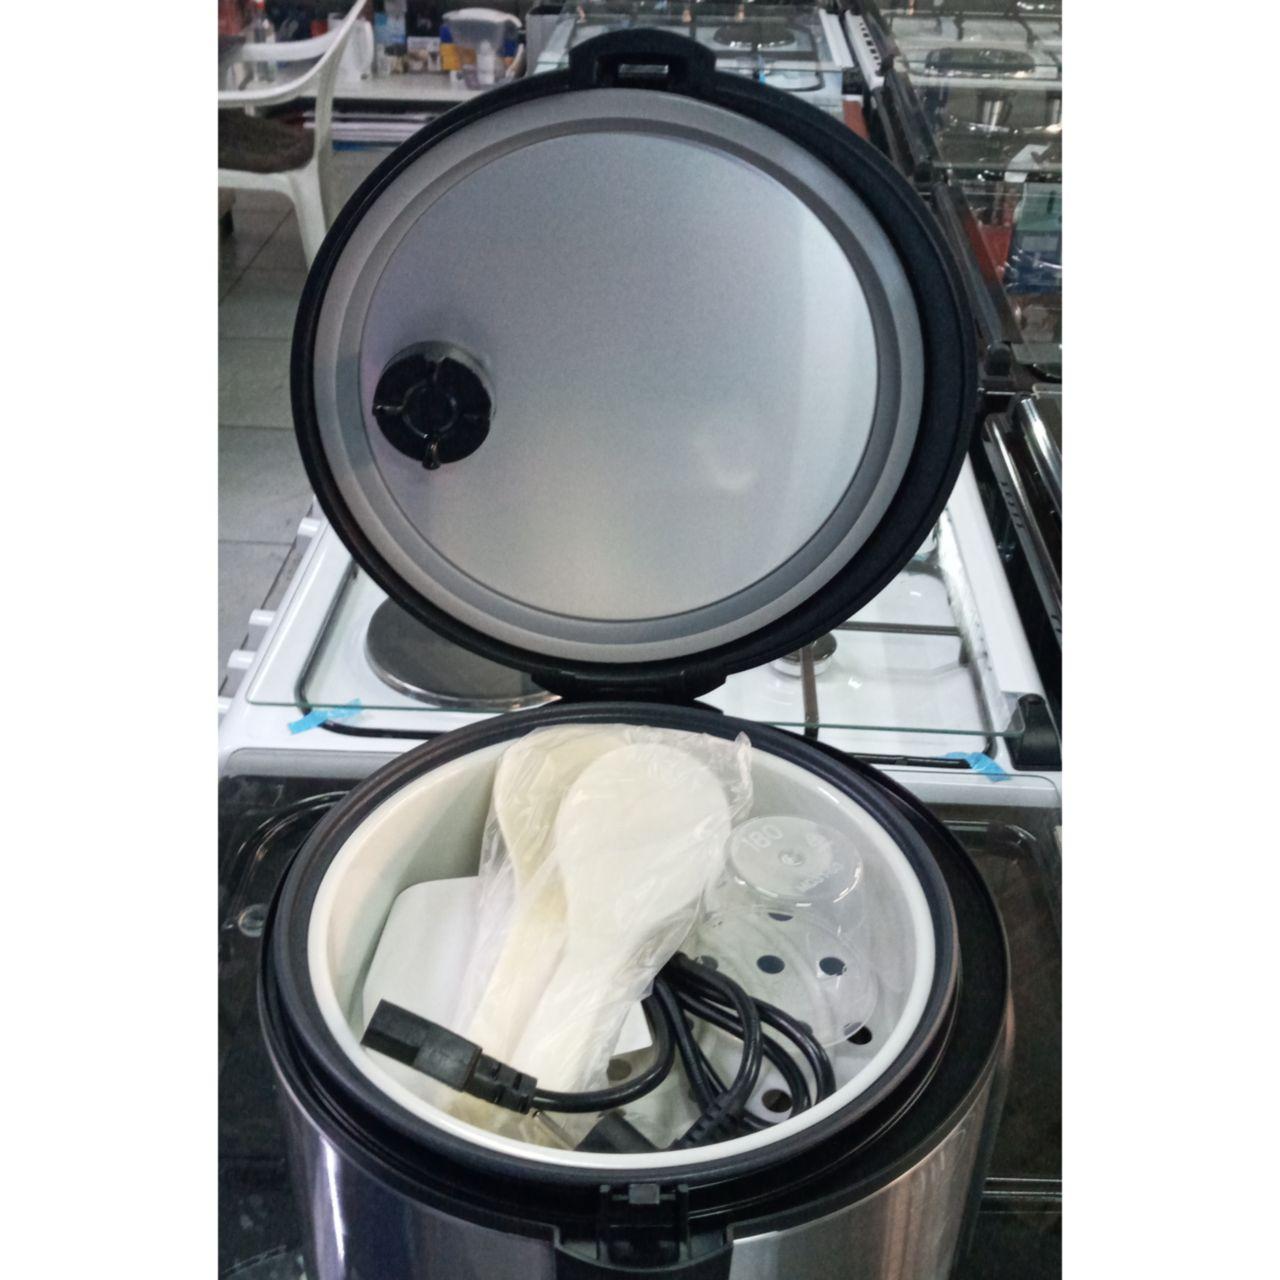 Мультиварка Midea объемом 5 литров